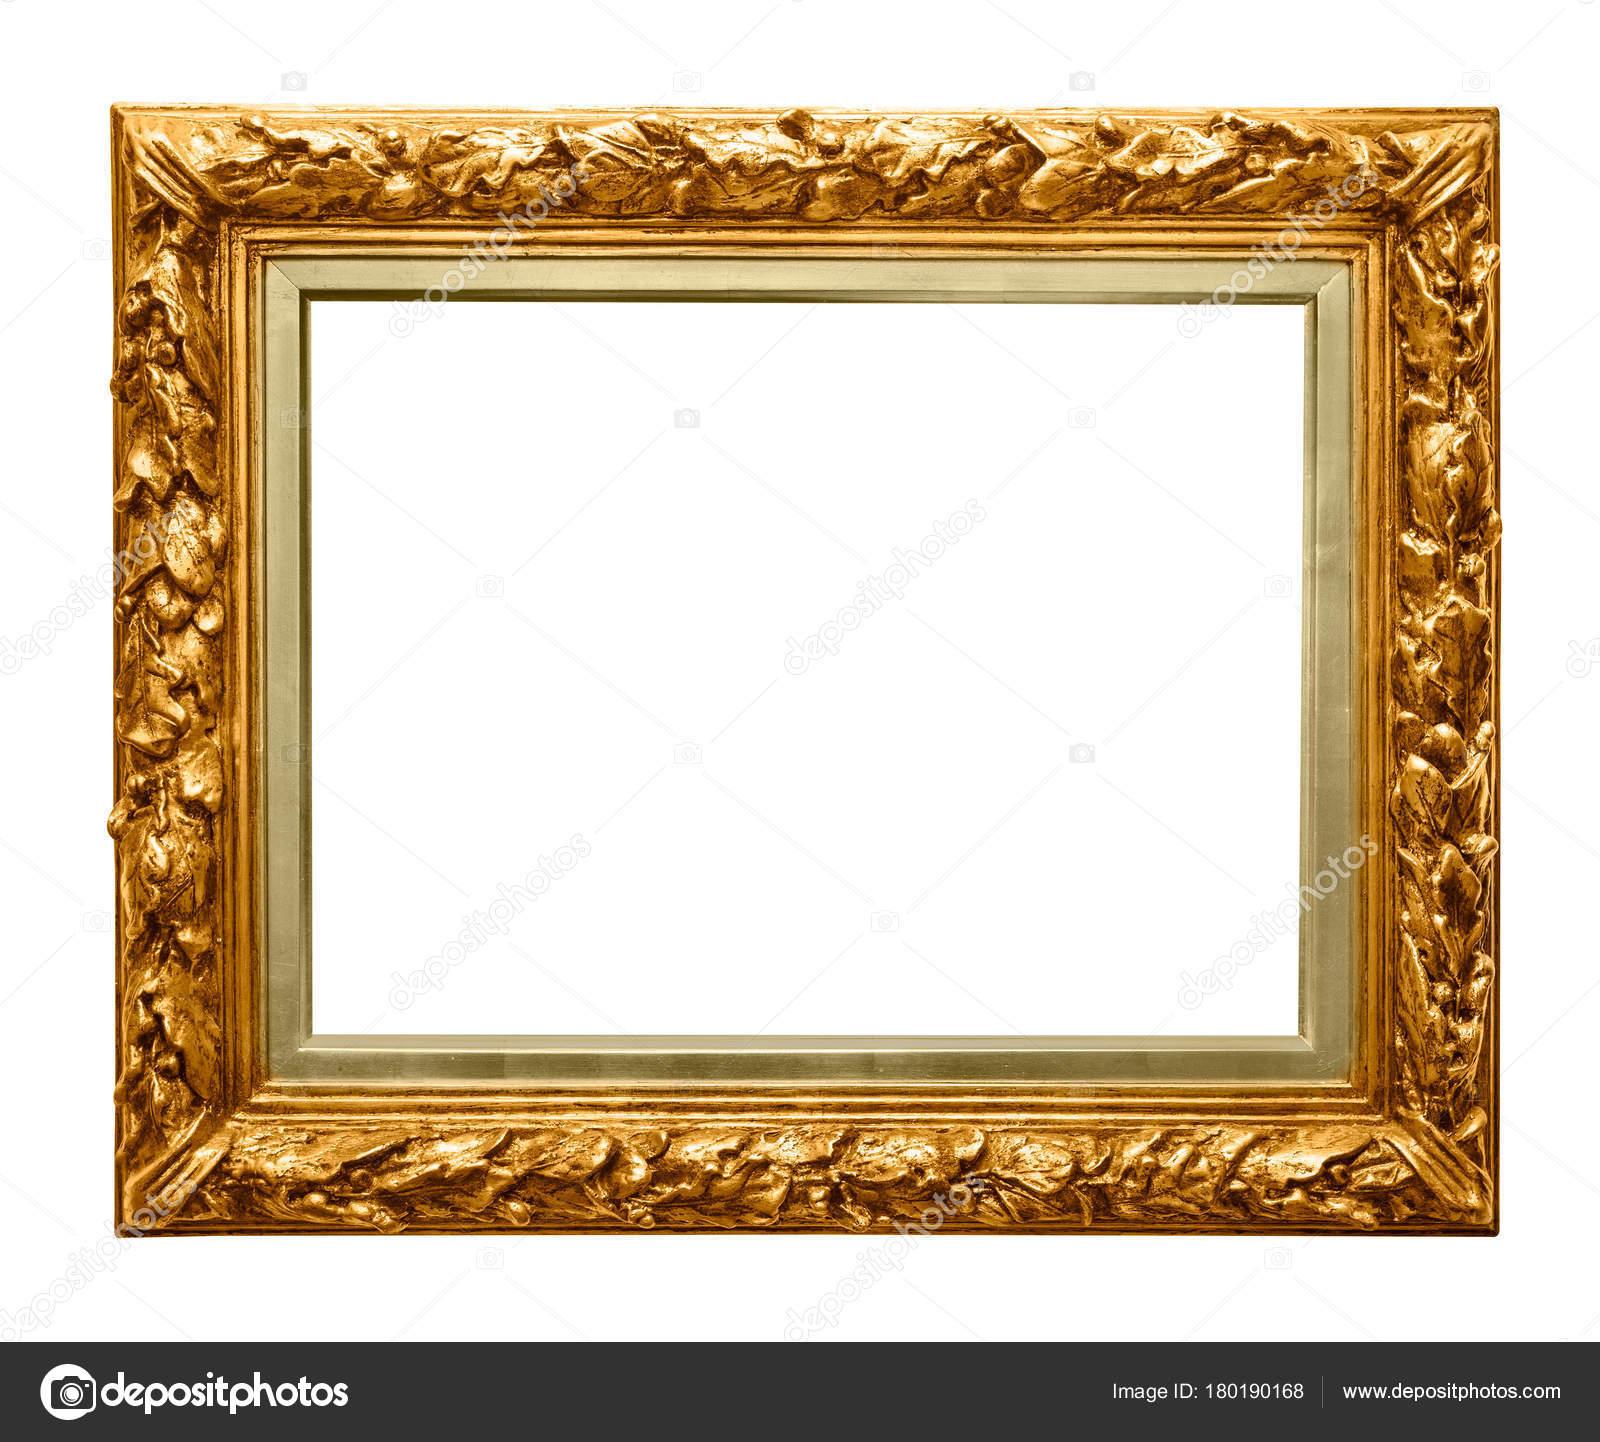 Goldener Rahmen auf weiß — Stockfoto © Goir #180190168